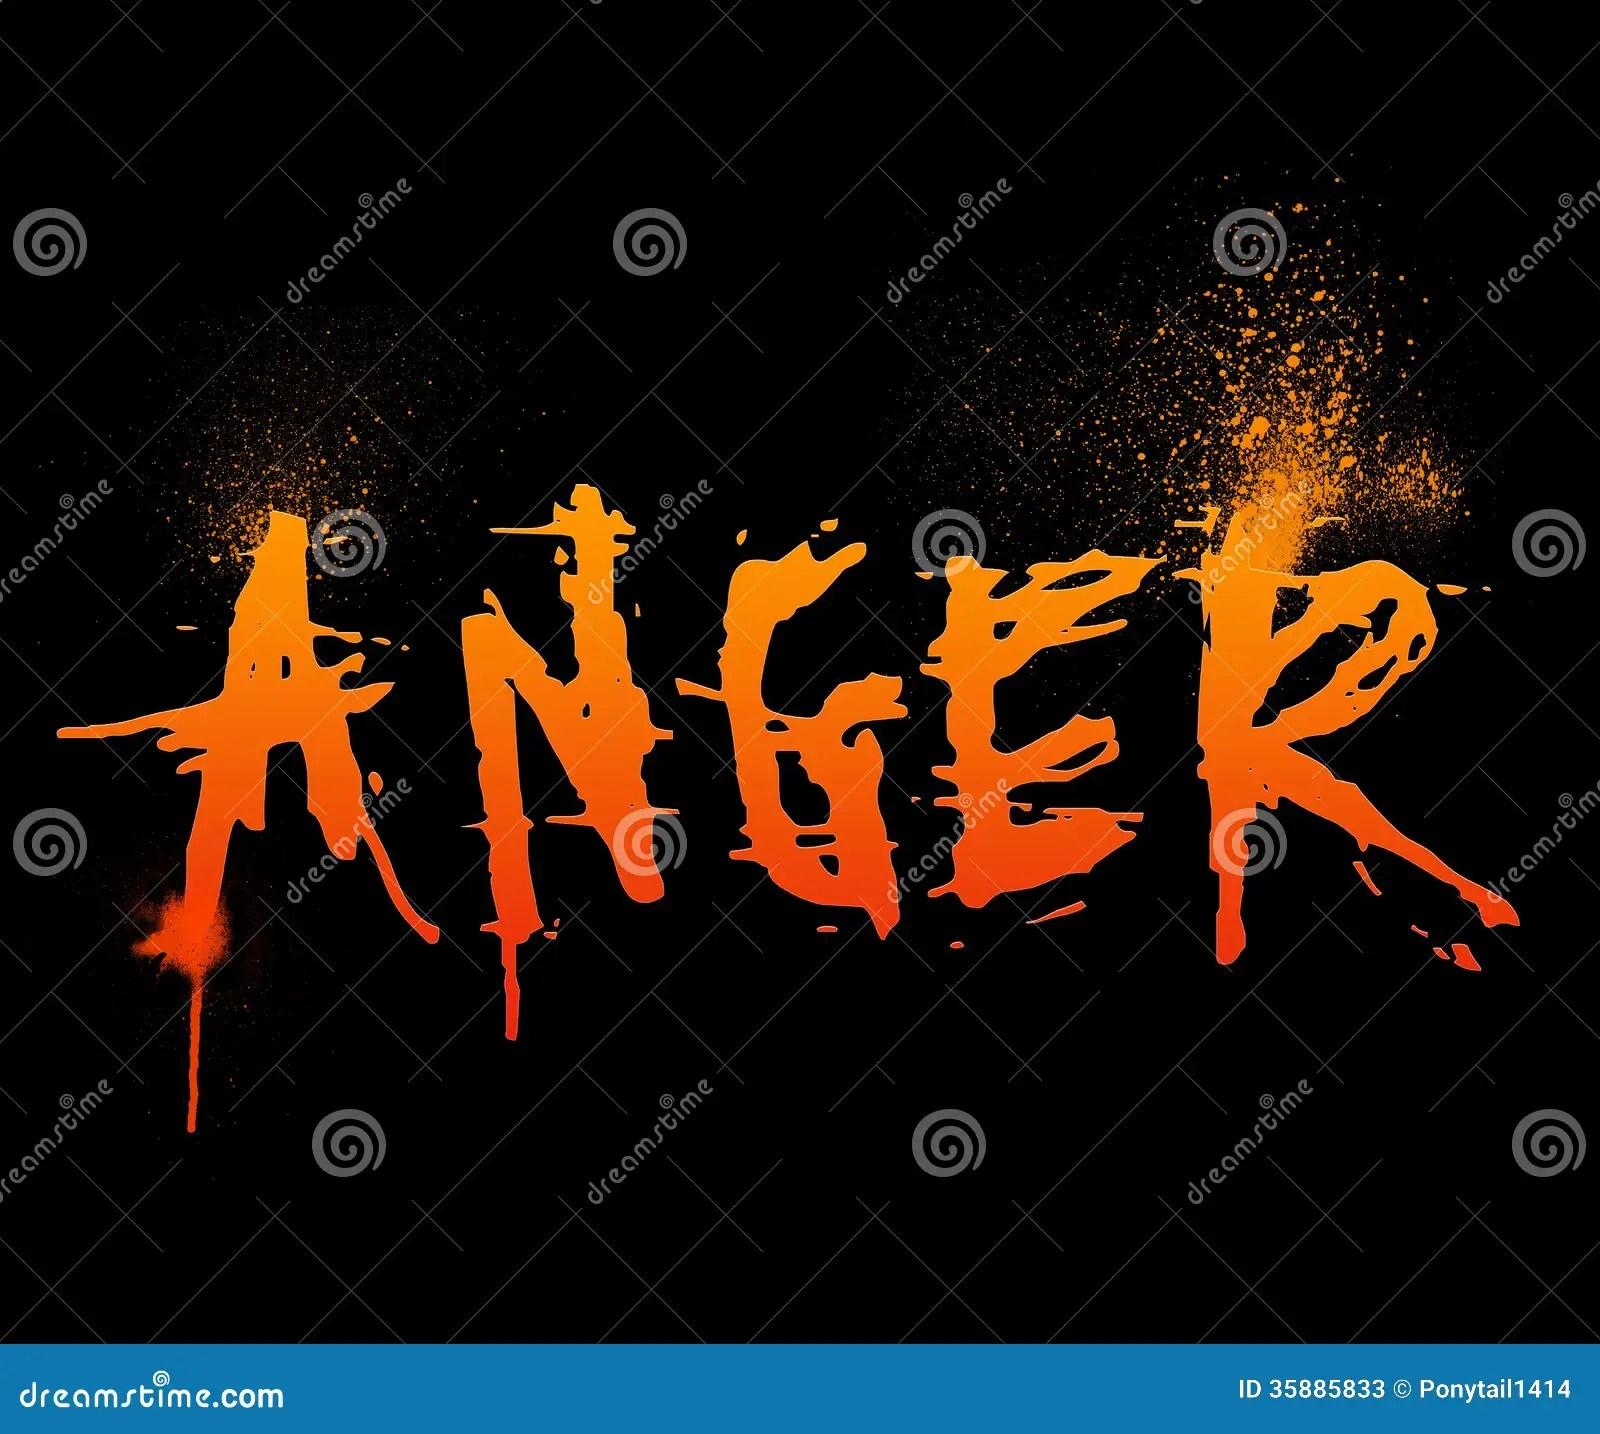 Anger Management Cards